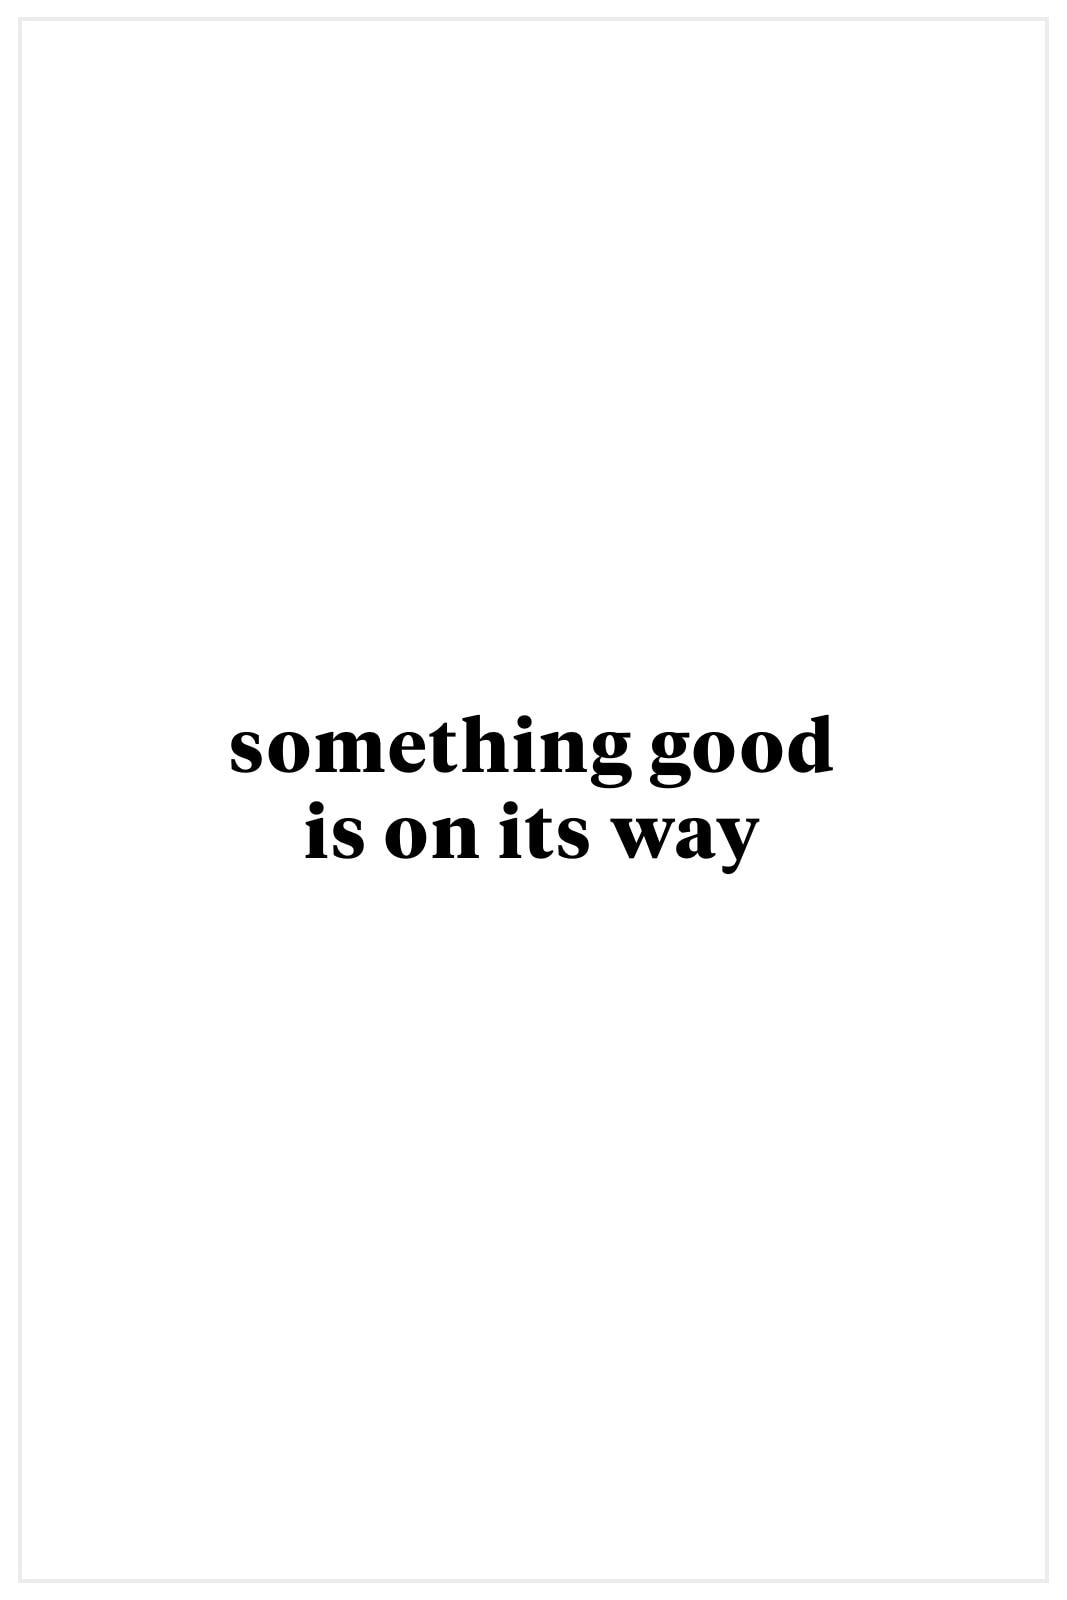 Soleil Skirt